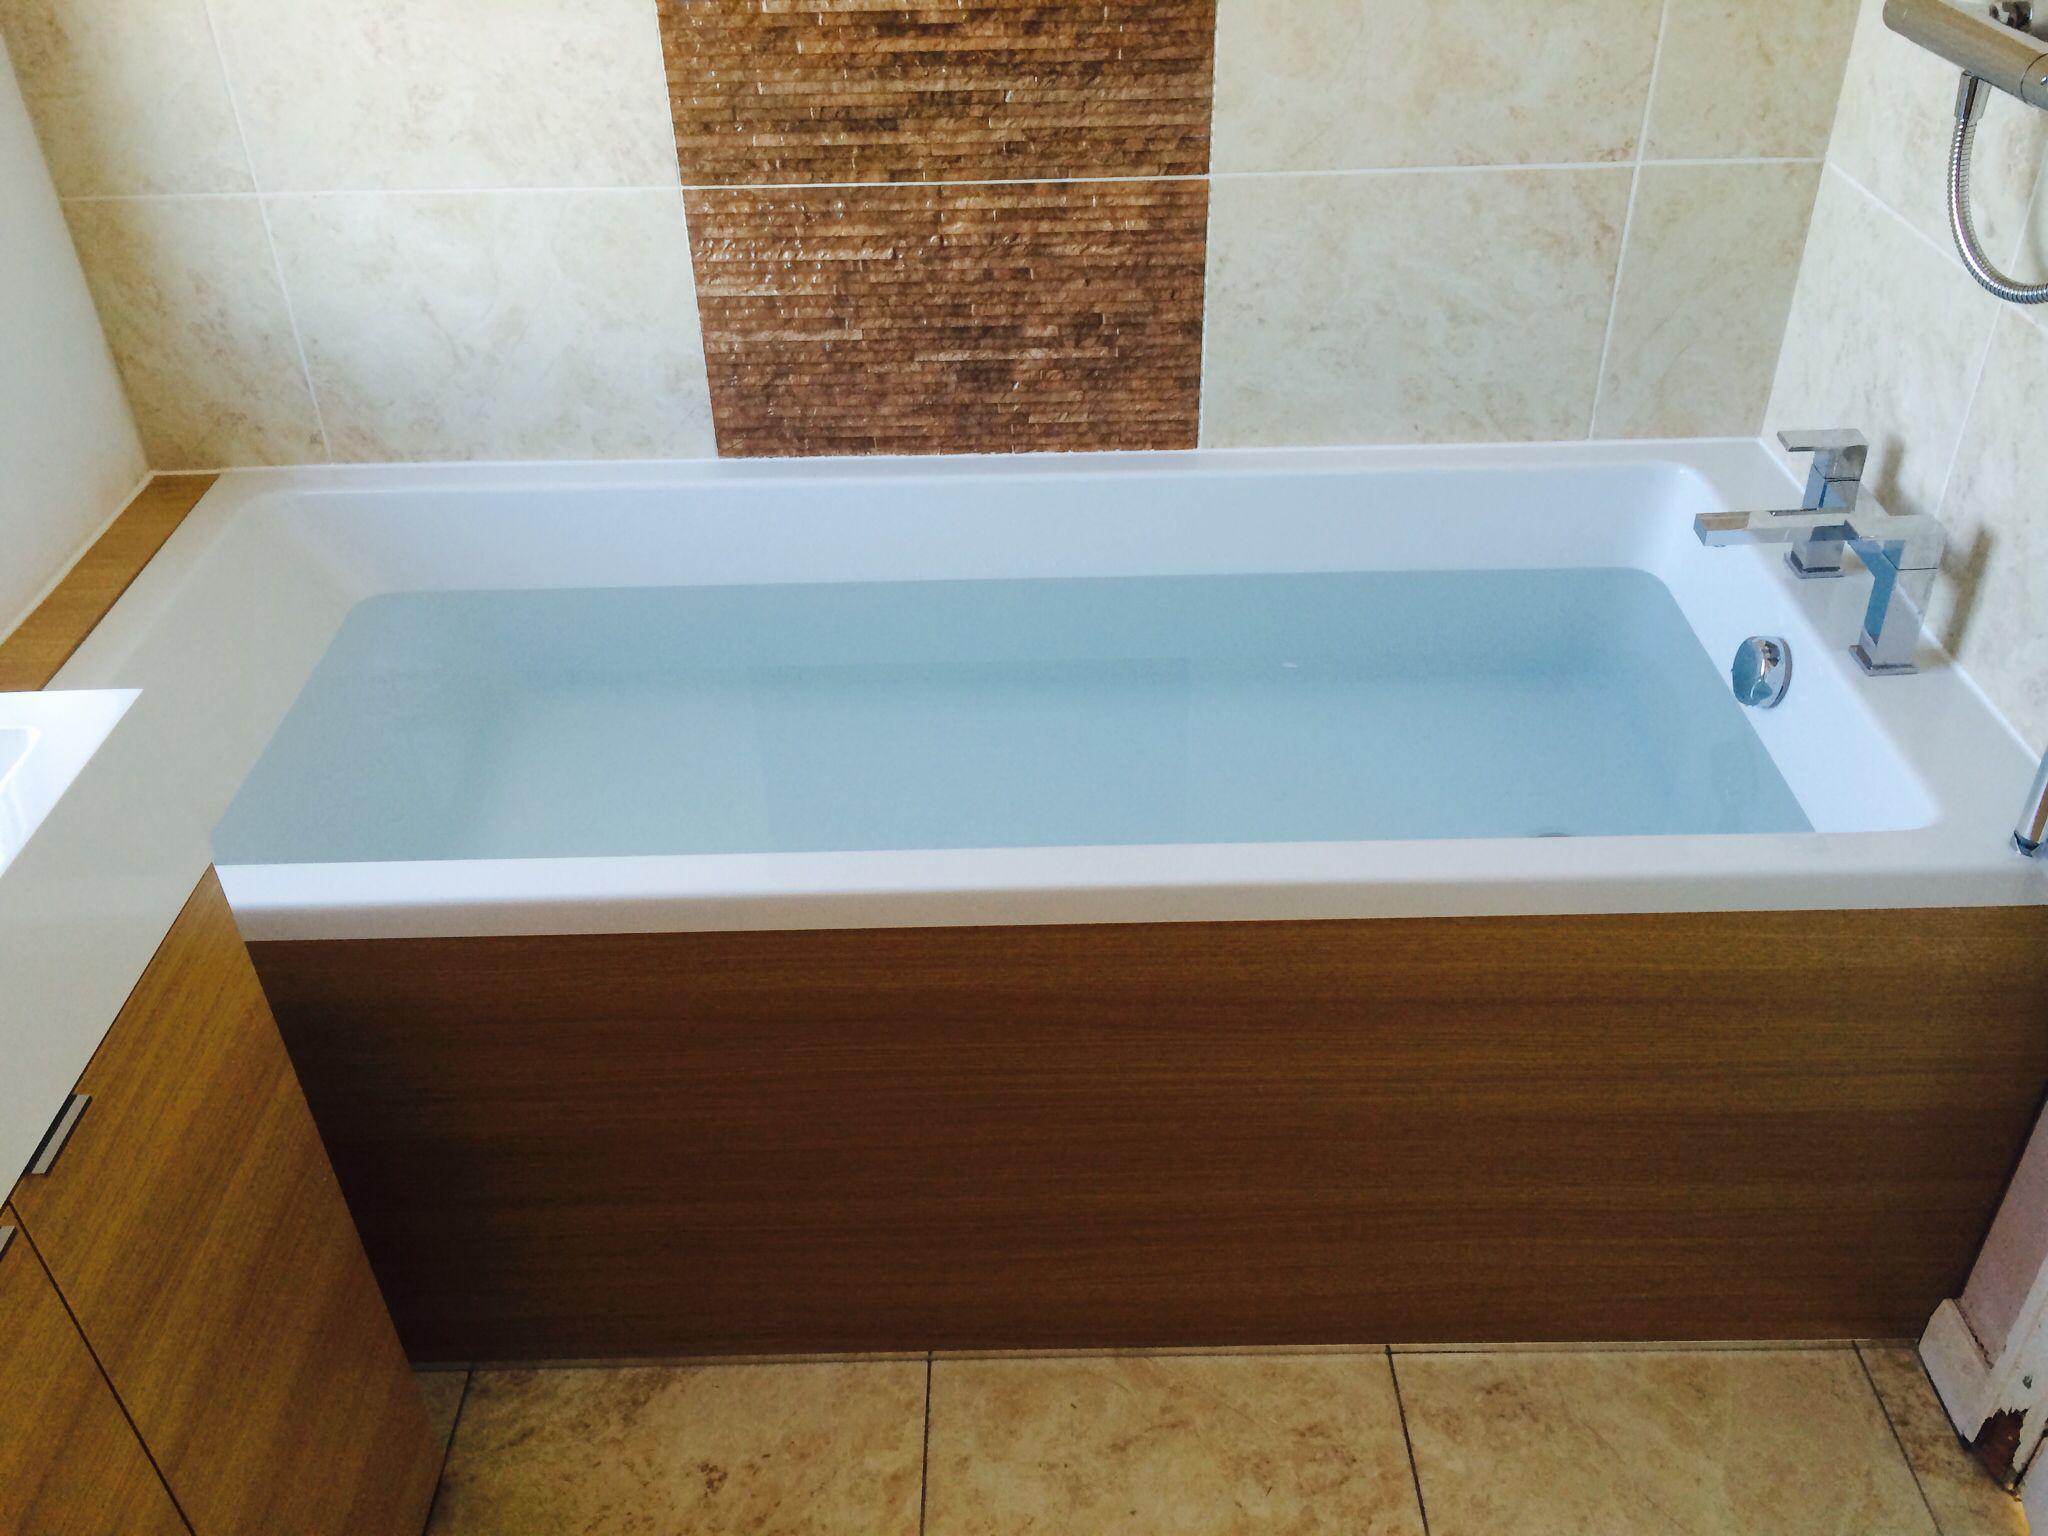 Wooden bath panel | Baths | Pinterest | Bath panel, Bath and House